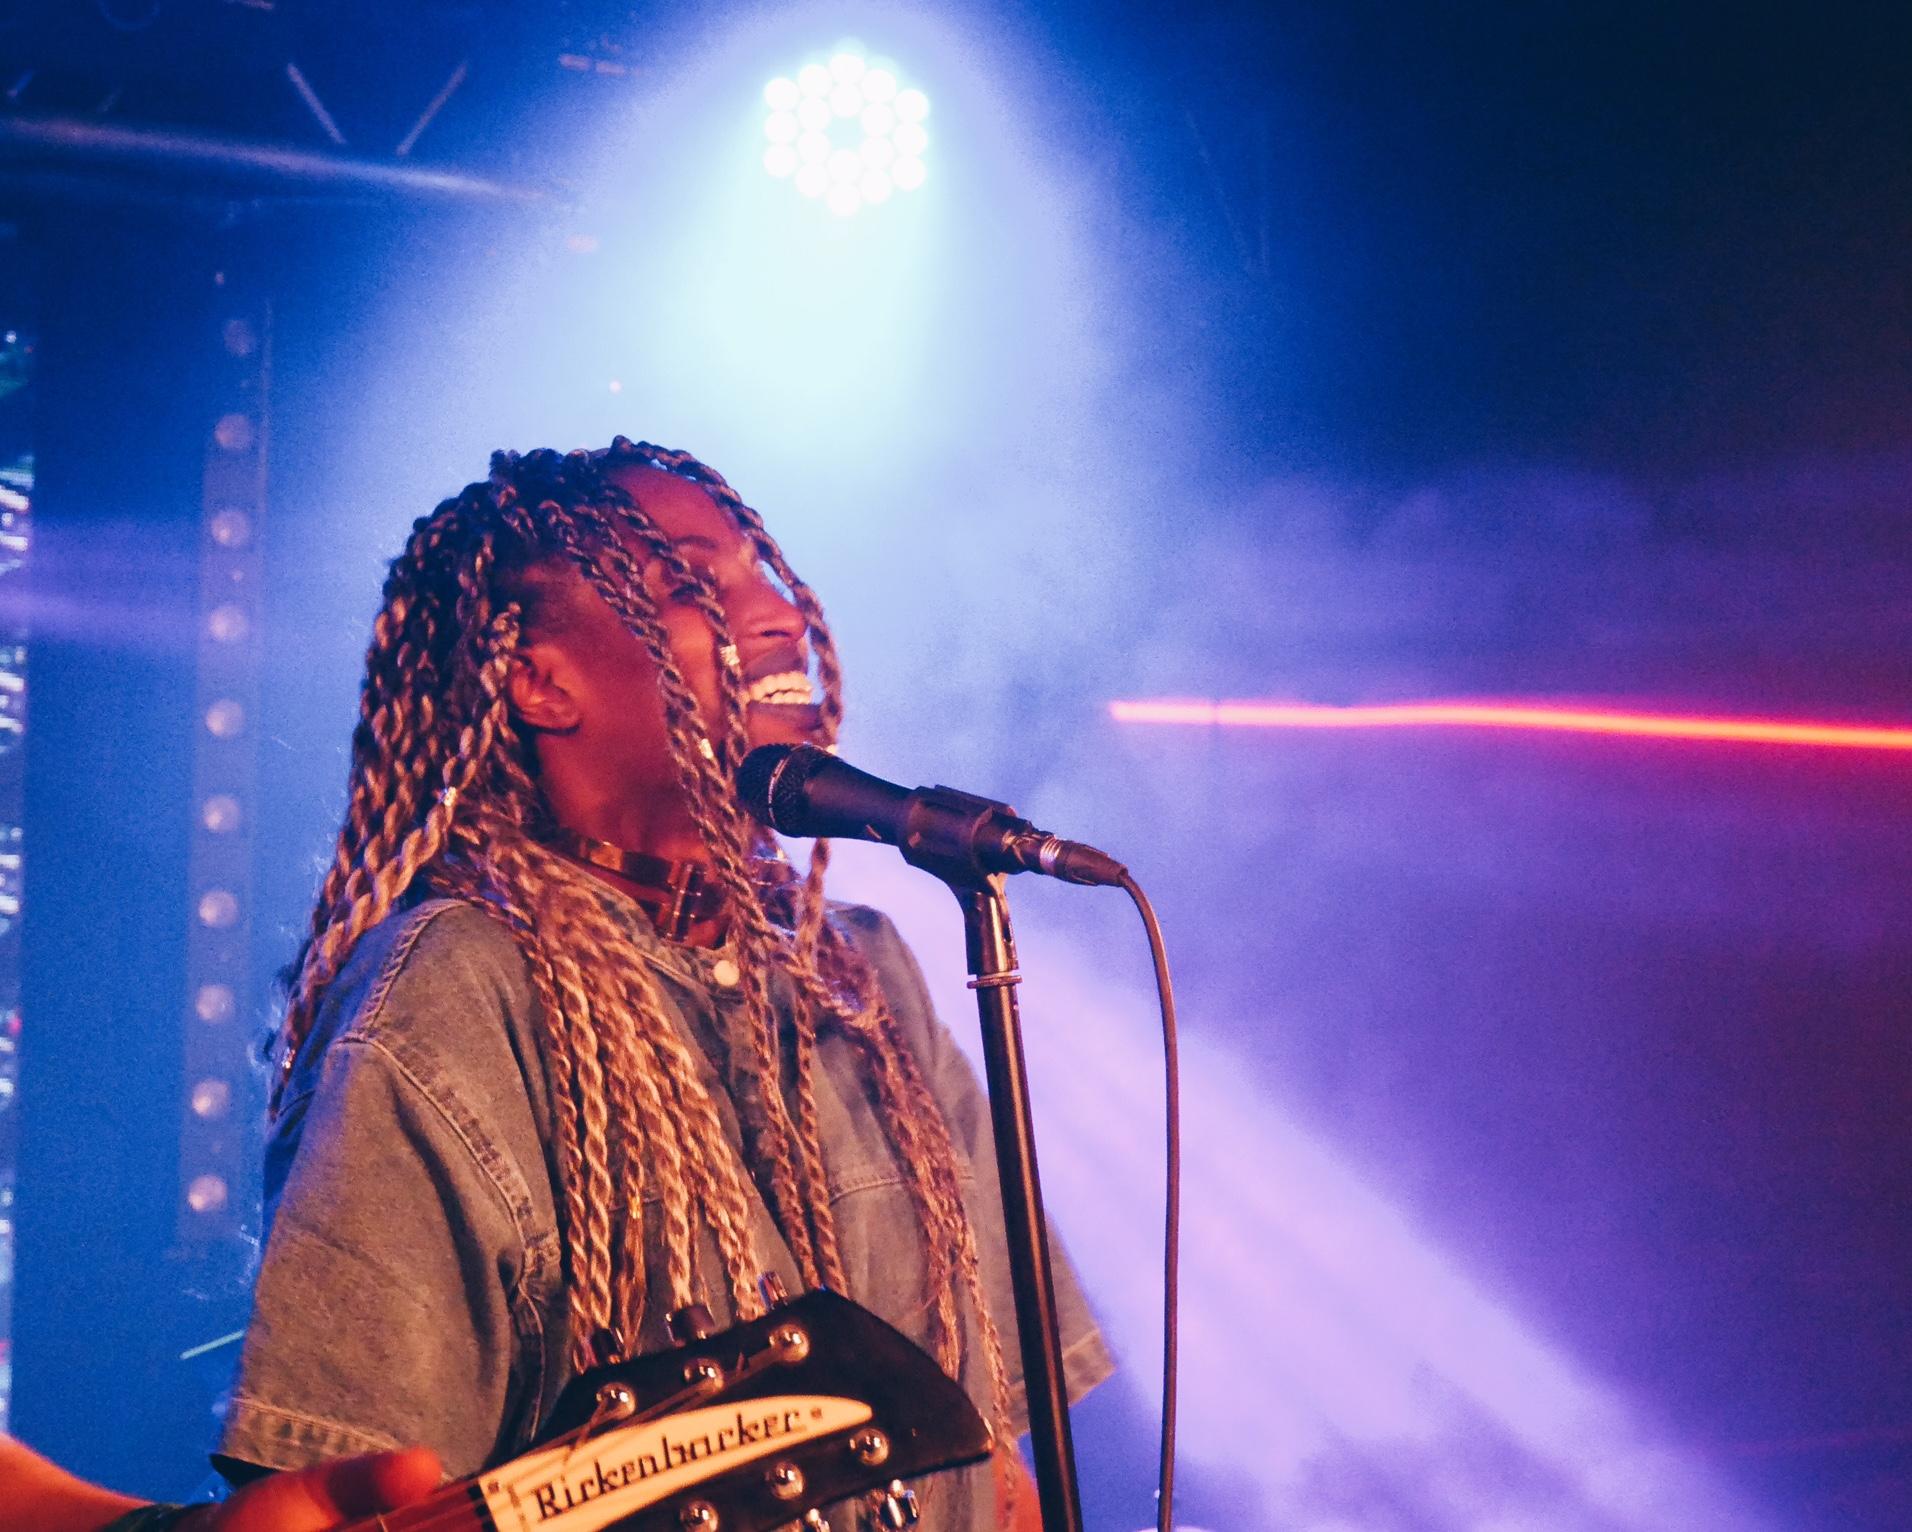 Rocky-the-band-live-concert-Bars-en-trans-2016-music-festival-Soft-Machines-tour-stage-photo-usofparis-blog